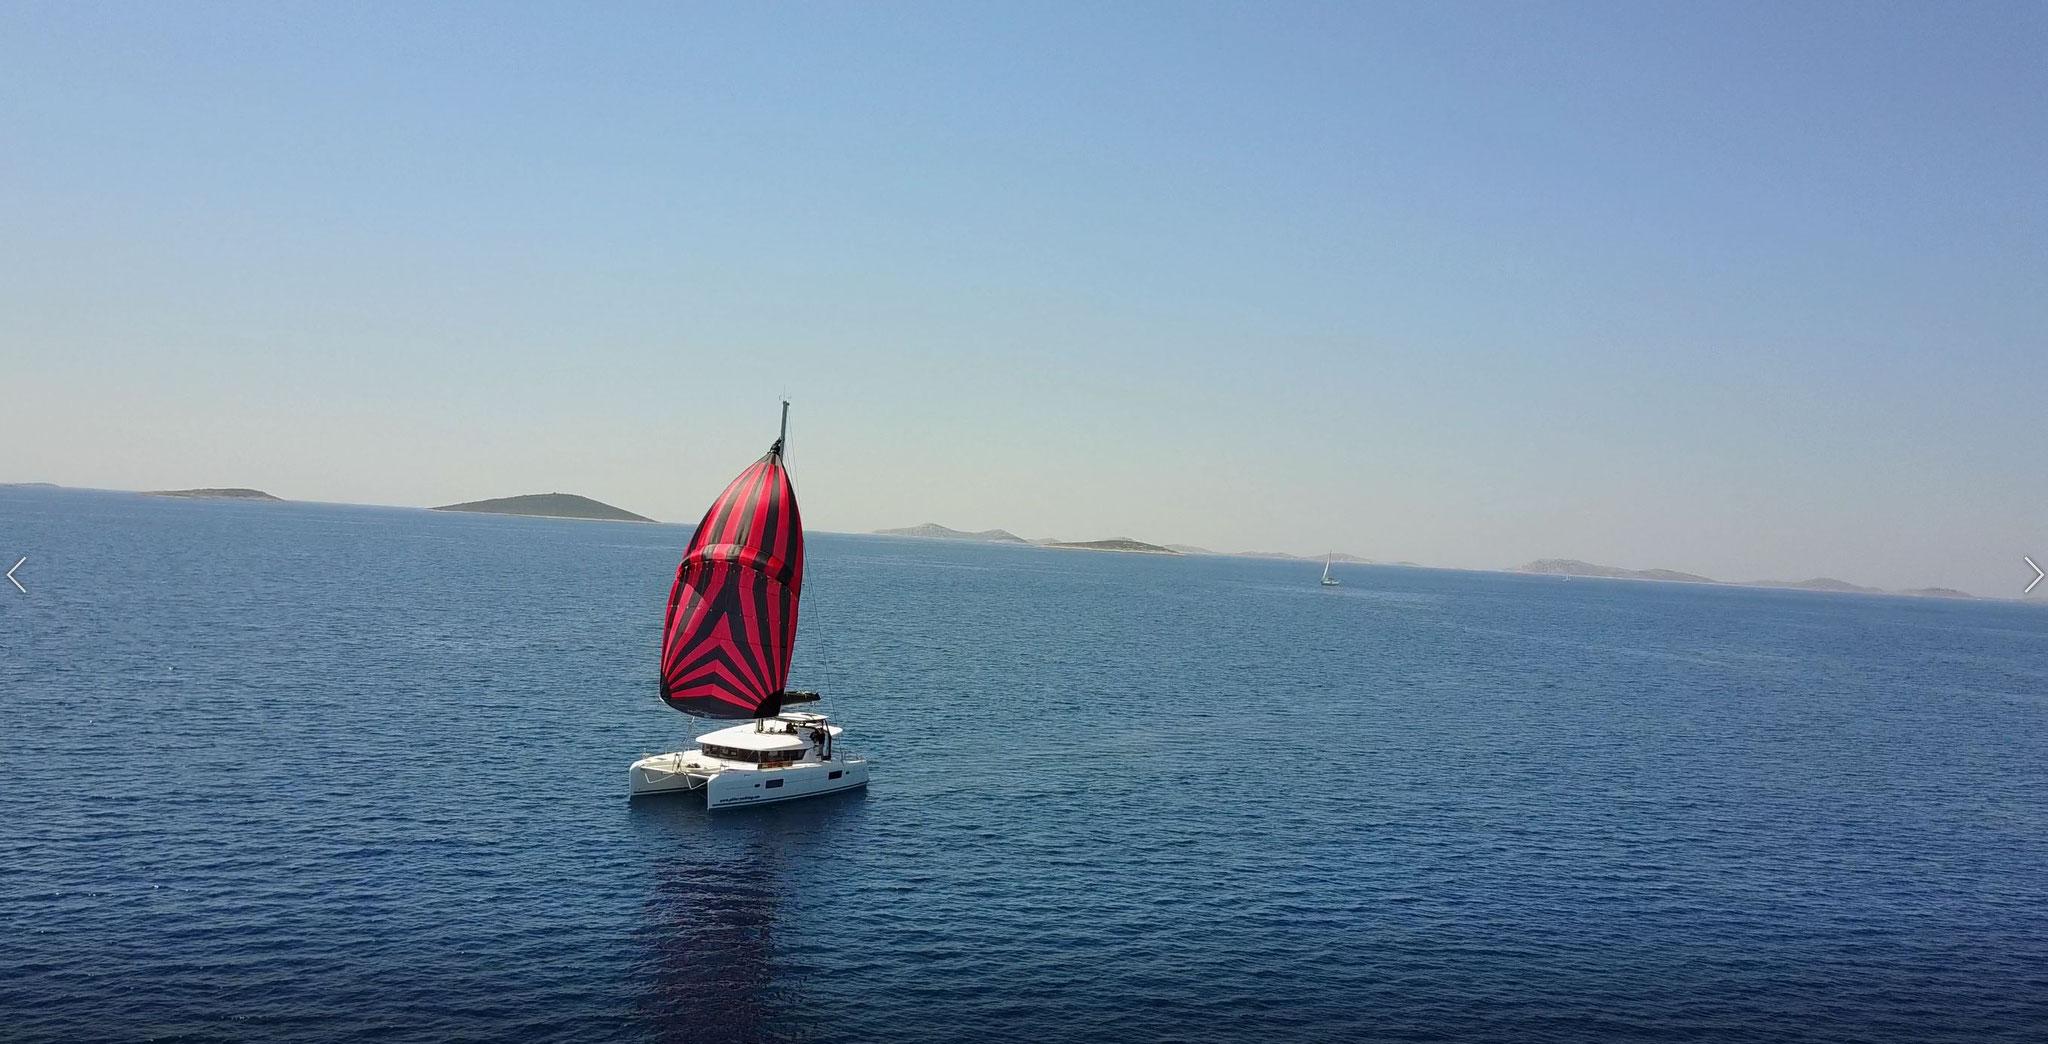 Karamaran fahren mit Lagoon 42 - Janny aus SCT Marina Trogir     -      www.katamarantraum.com